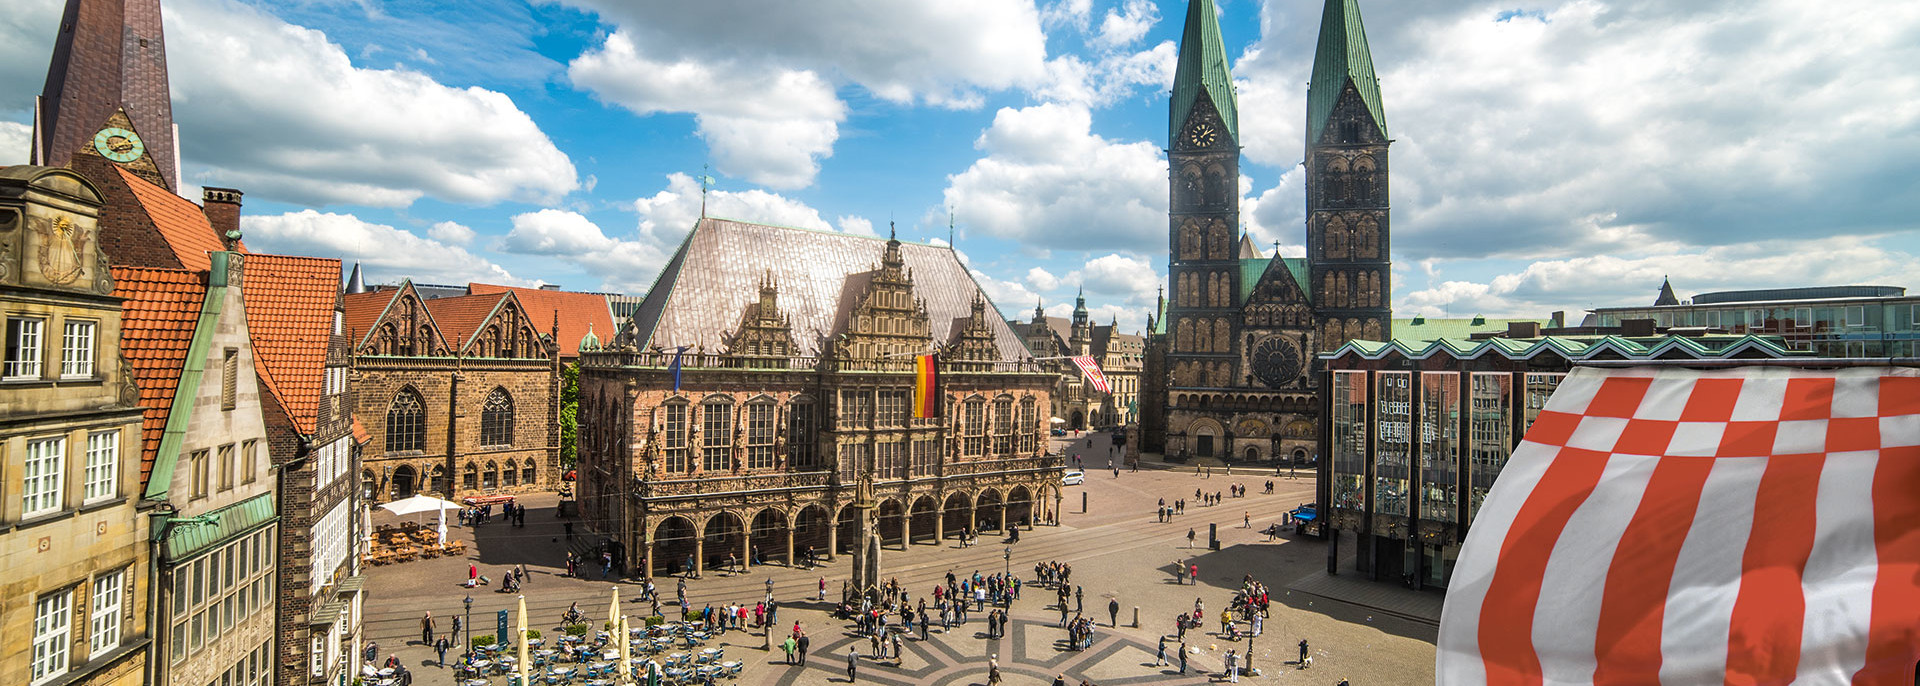 Bremen tourismus de bremen kennenlernen [PUNIQRANDLINE-(au-dating-names.txt) 62